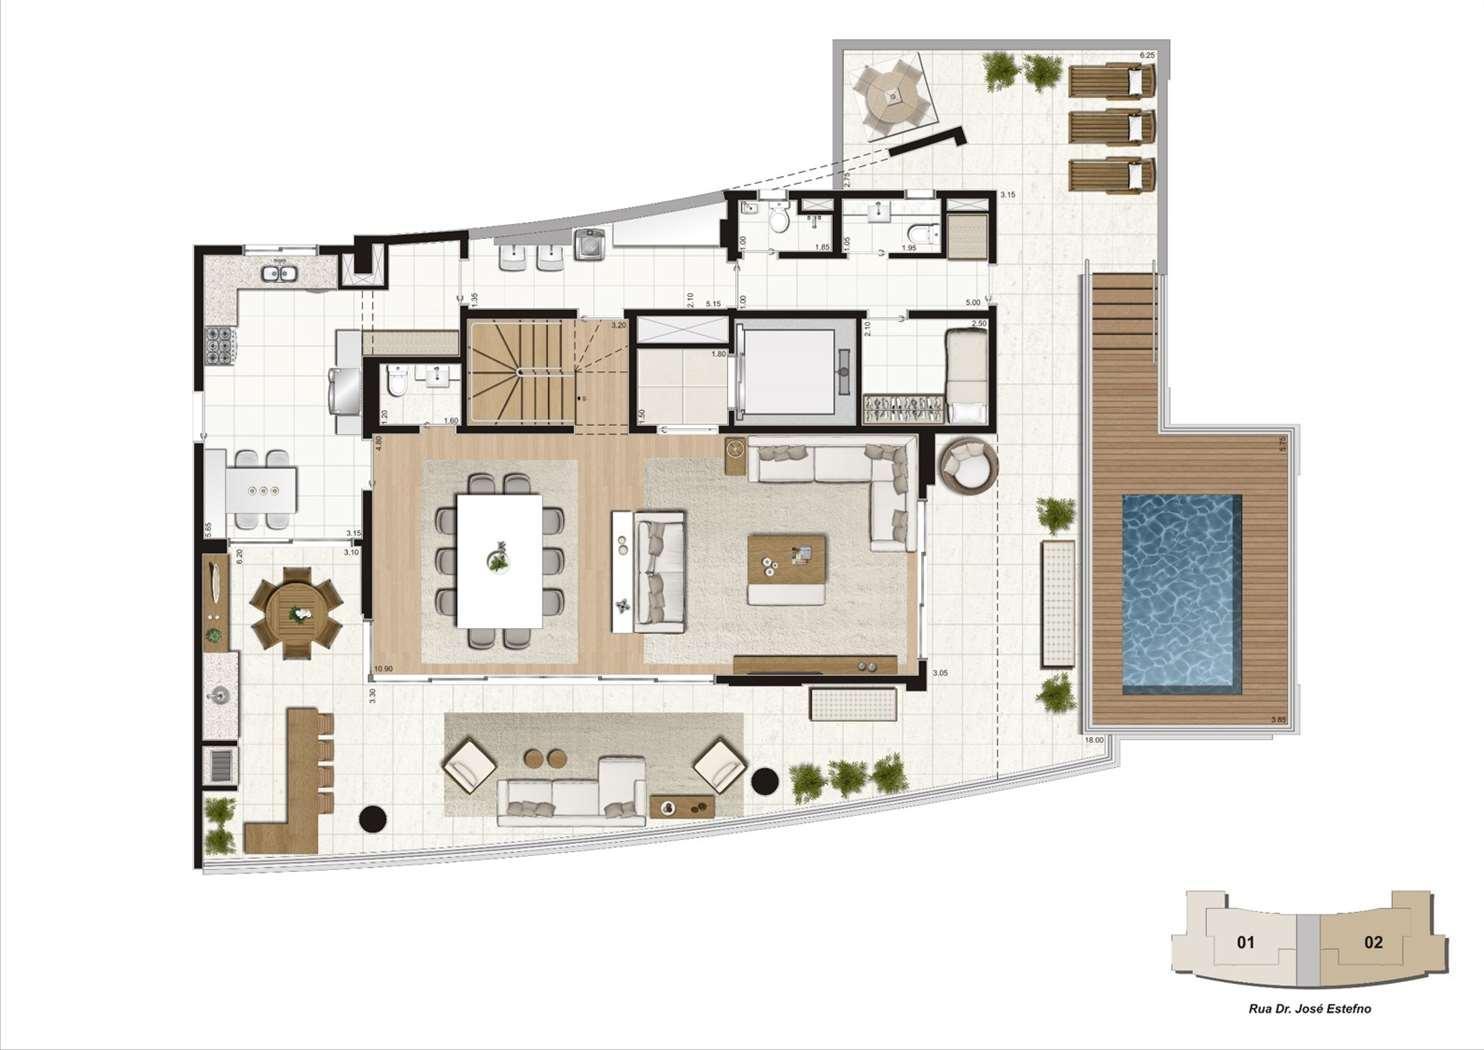 Planta cobertura duplex 460m², 4 suítes  - Pavimento inferior